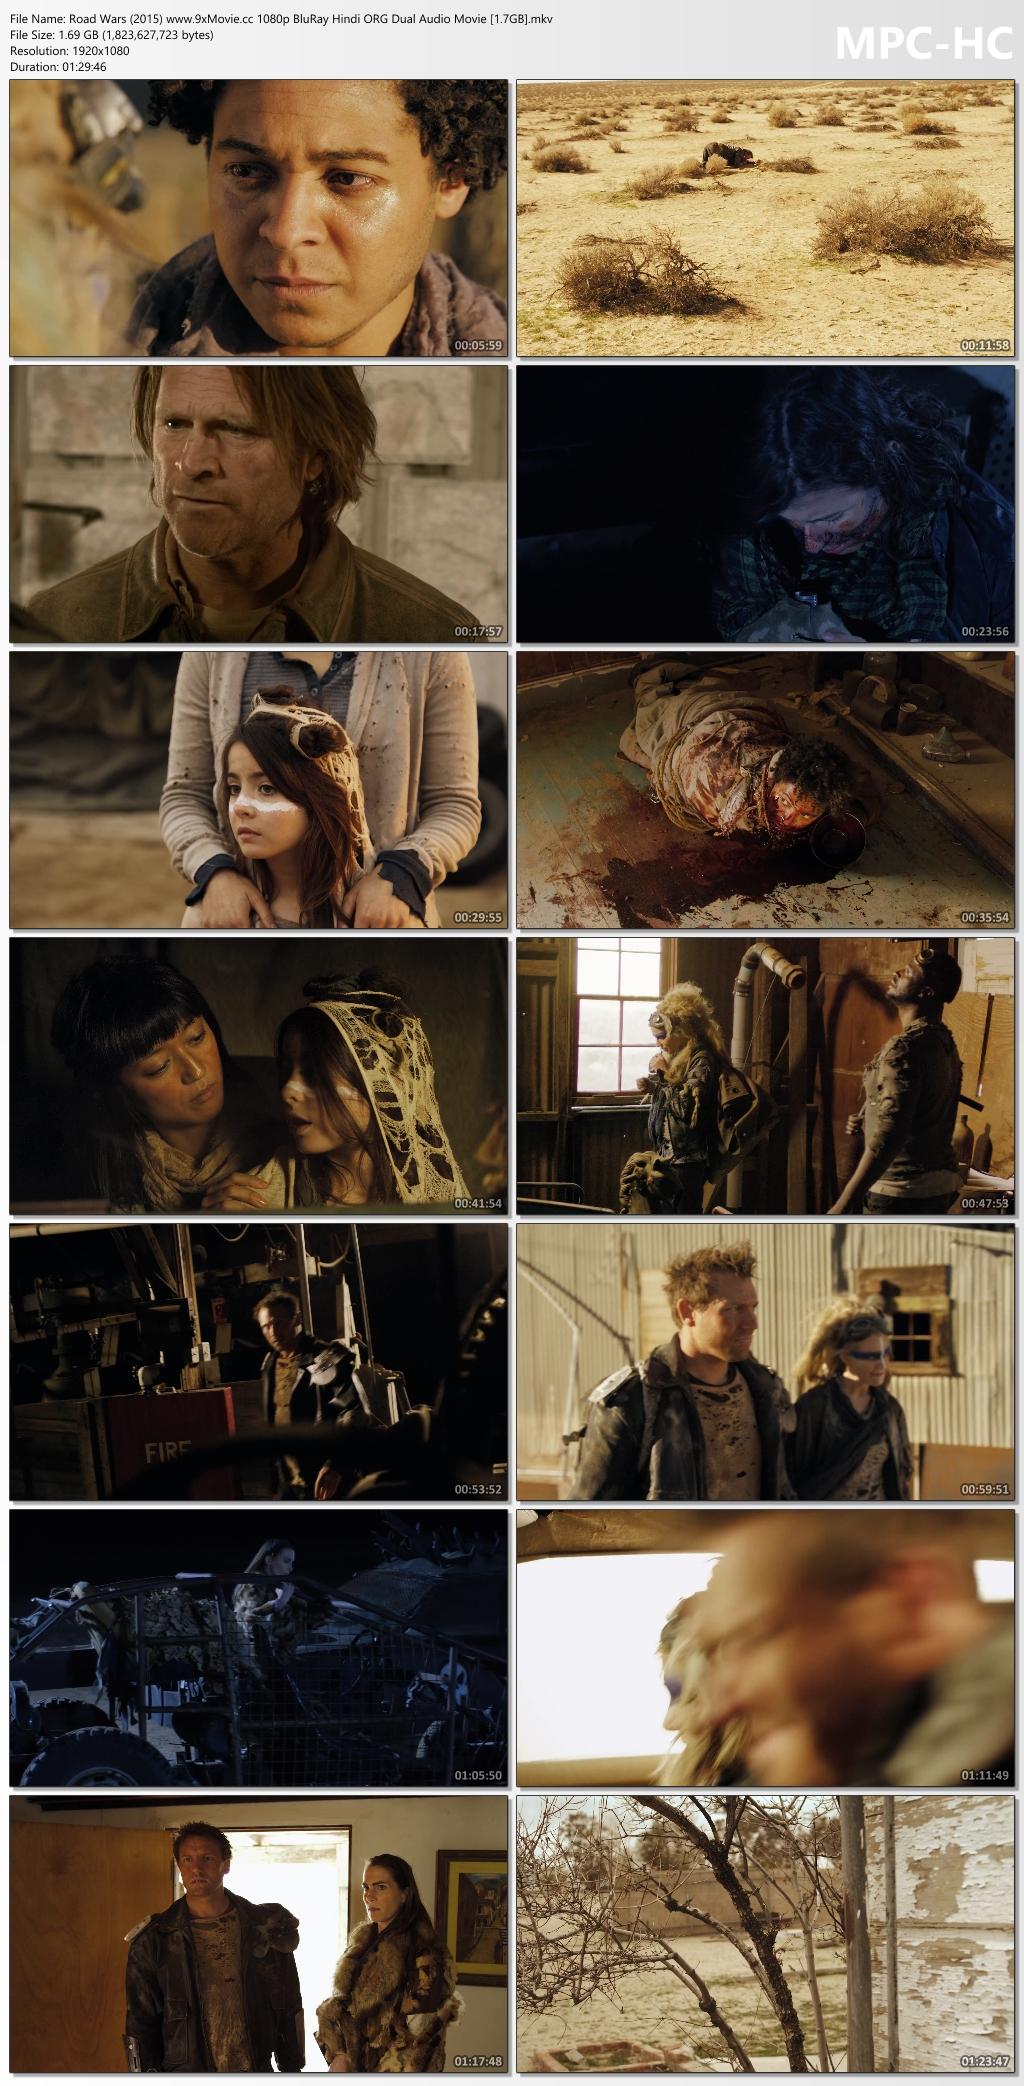 Road-Wars-2015-www-9x-Movie-cc-1080p-Blu-Ray-Hindi-ORG-Dual-Audio-Movie-1-7-GB-mkv